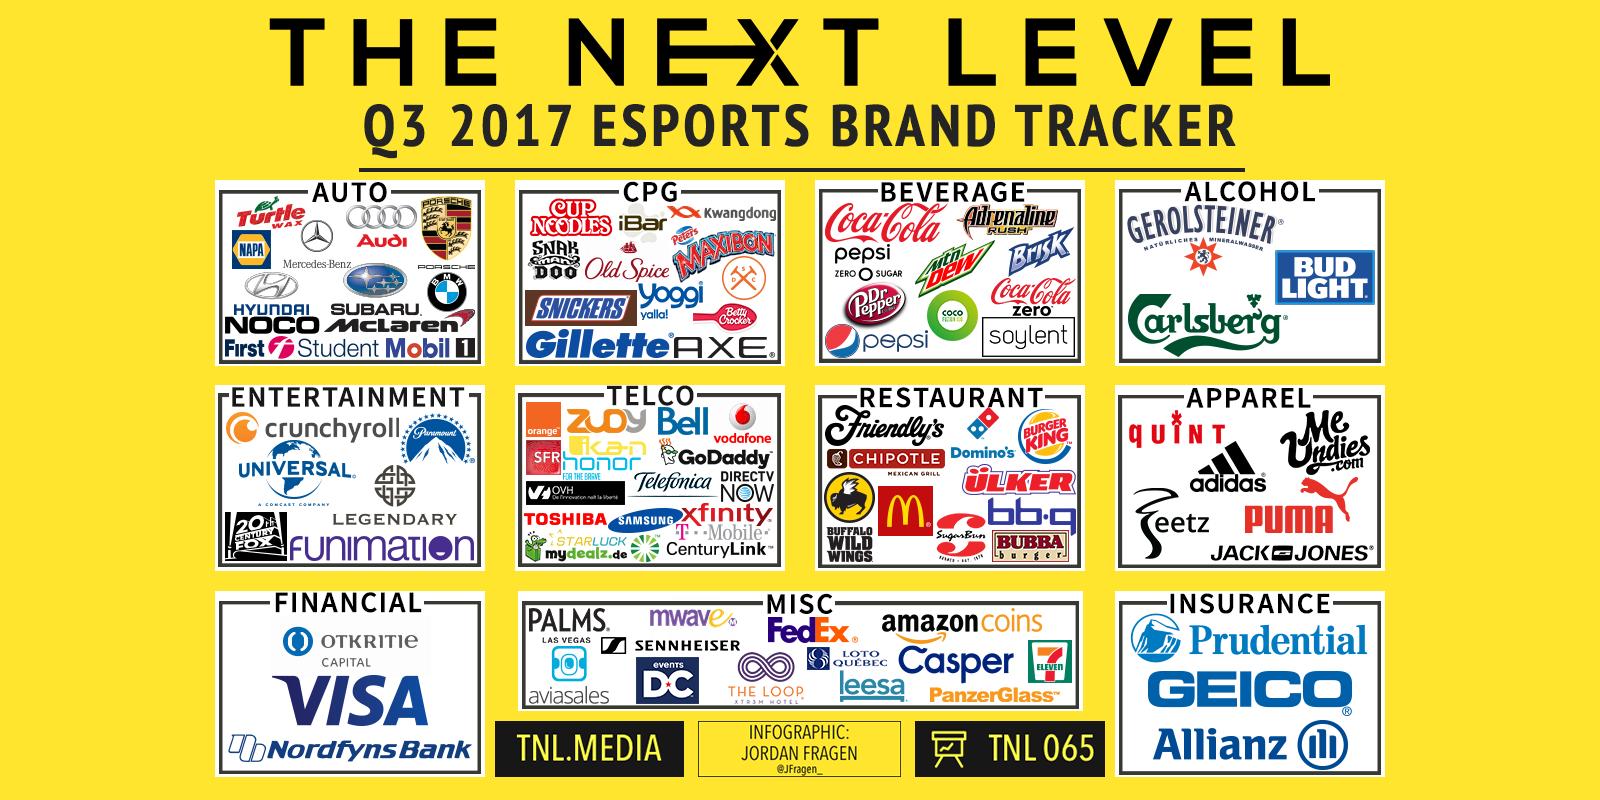 TNL Infographic 065: Q3 2017 eSports Brand Tracker (Infographic: Jordan Fragen)